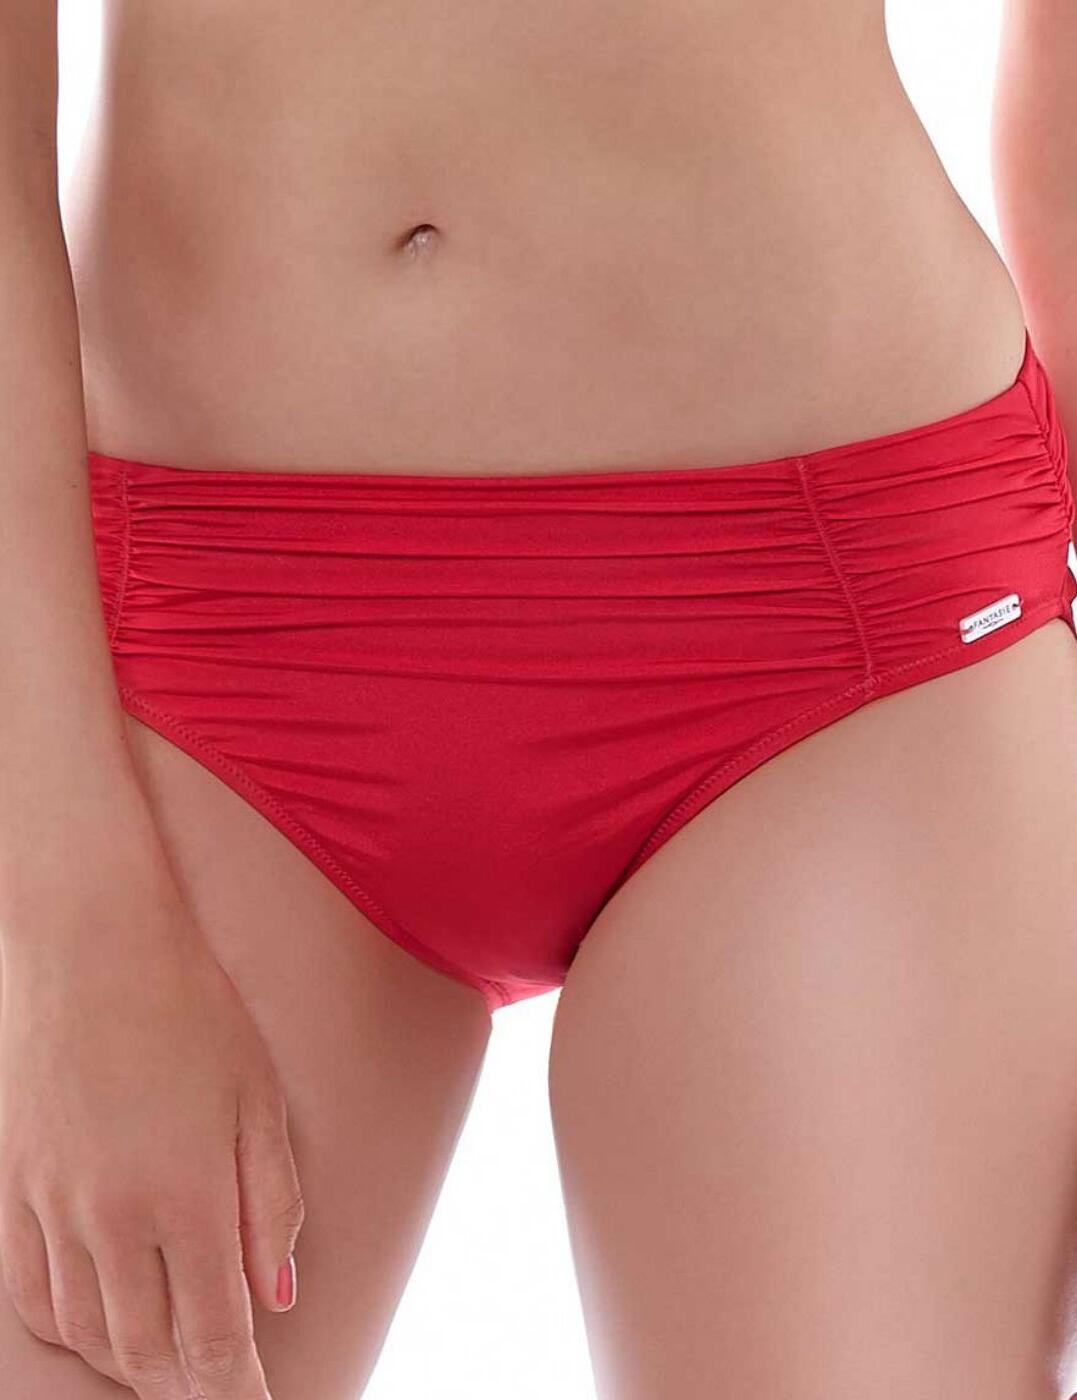 6155 Fantasie Los Cabos Gathered Bikini Brief - 6155 Coral Red